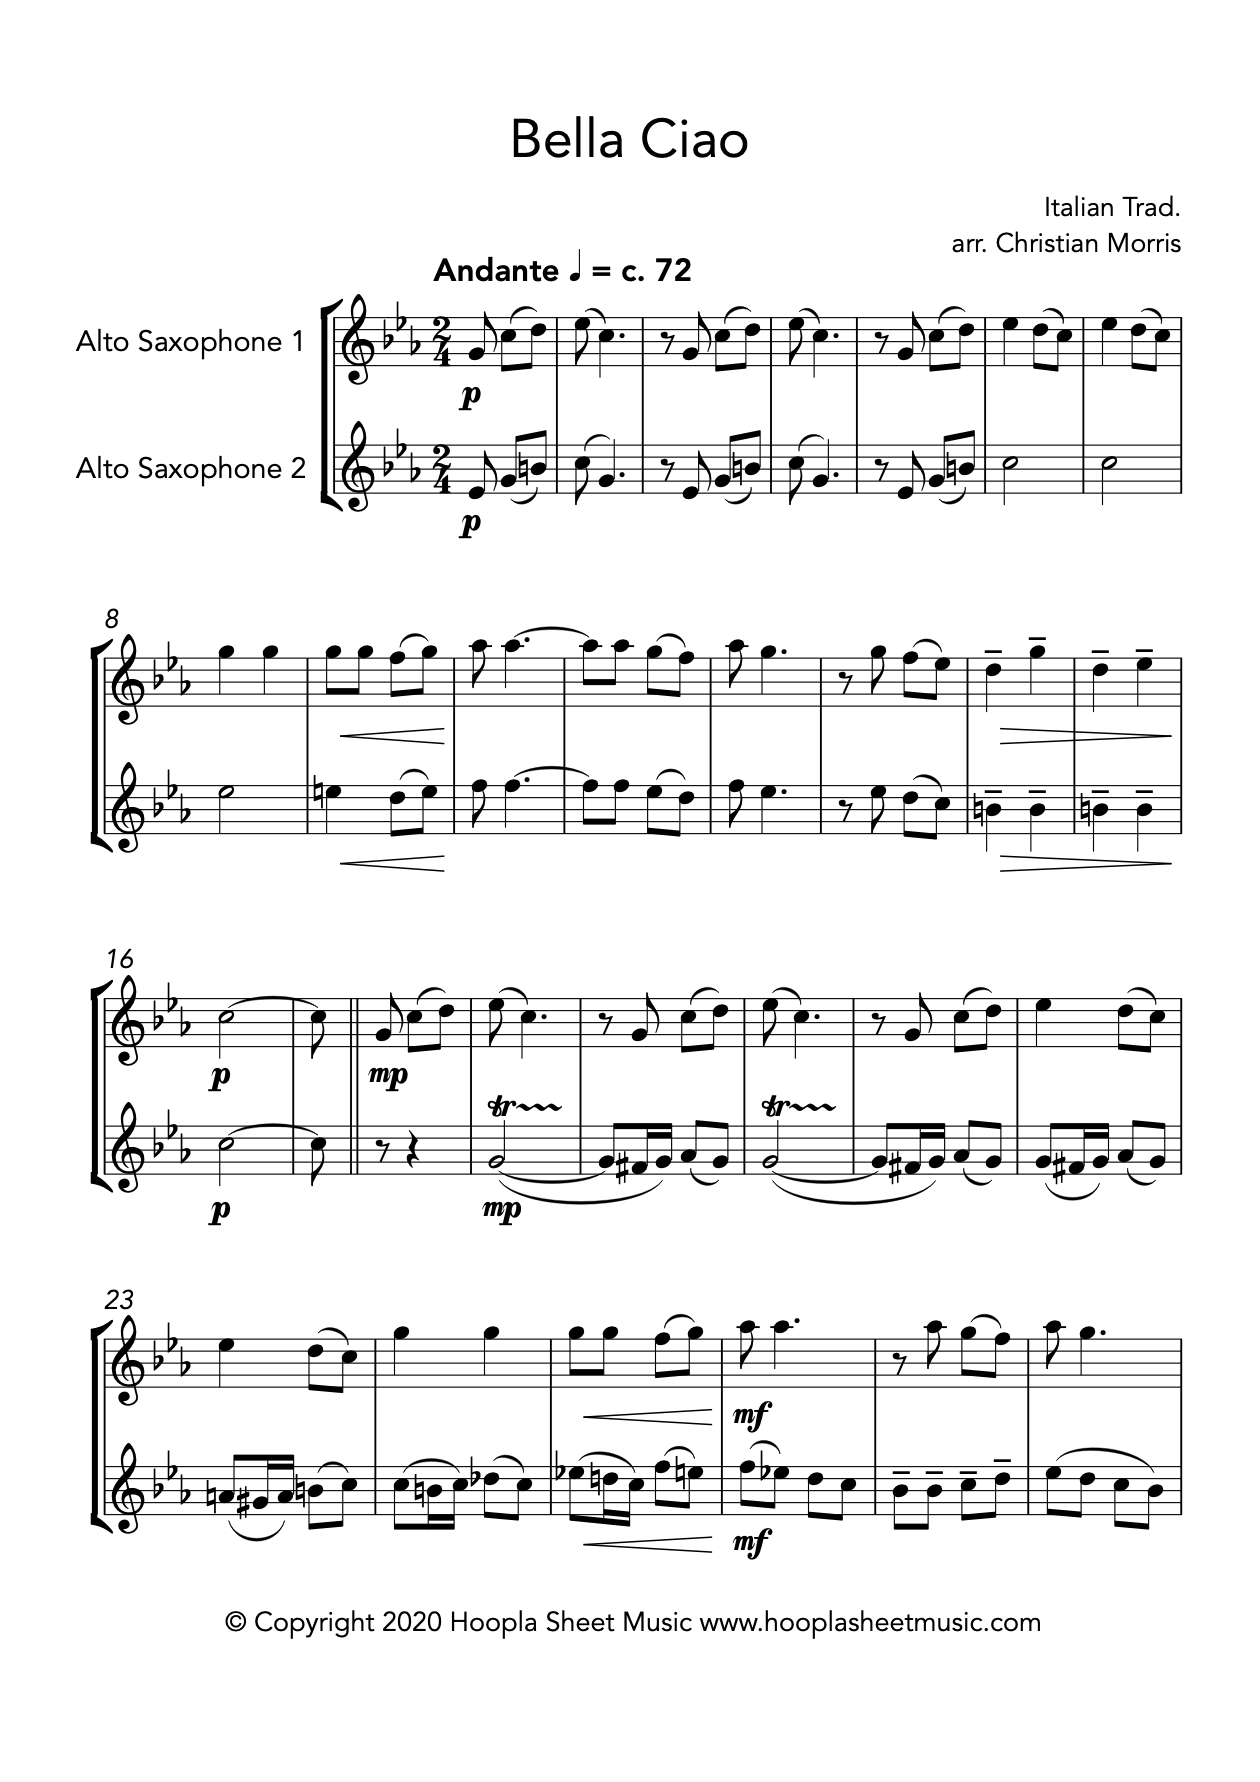 Bella Ciao (Alto Saxophone Duet)